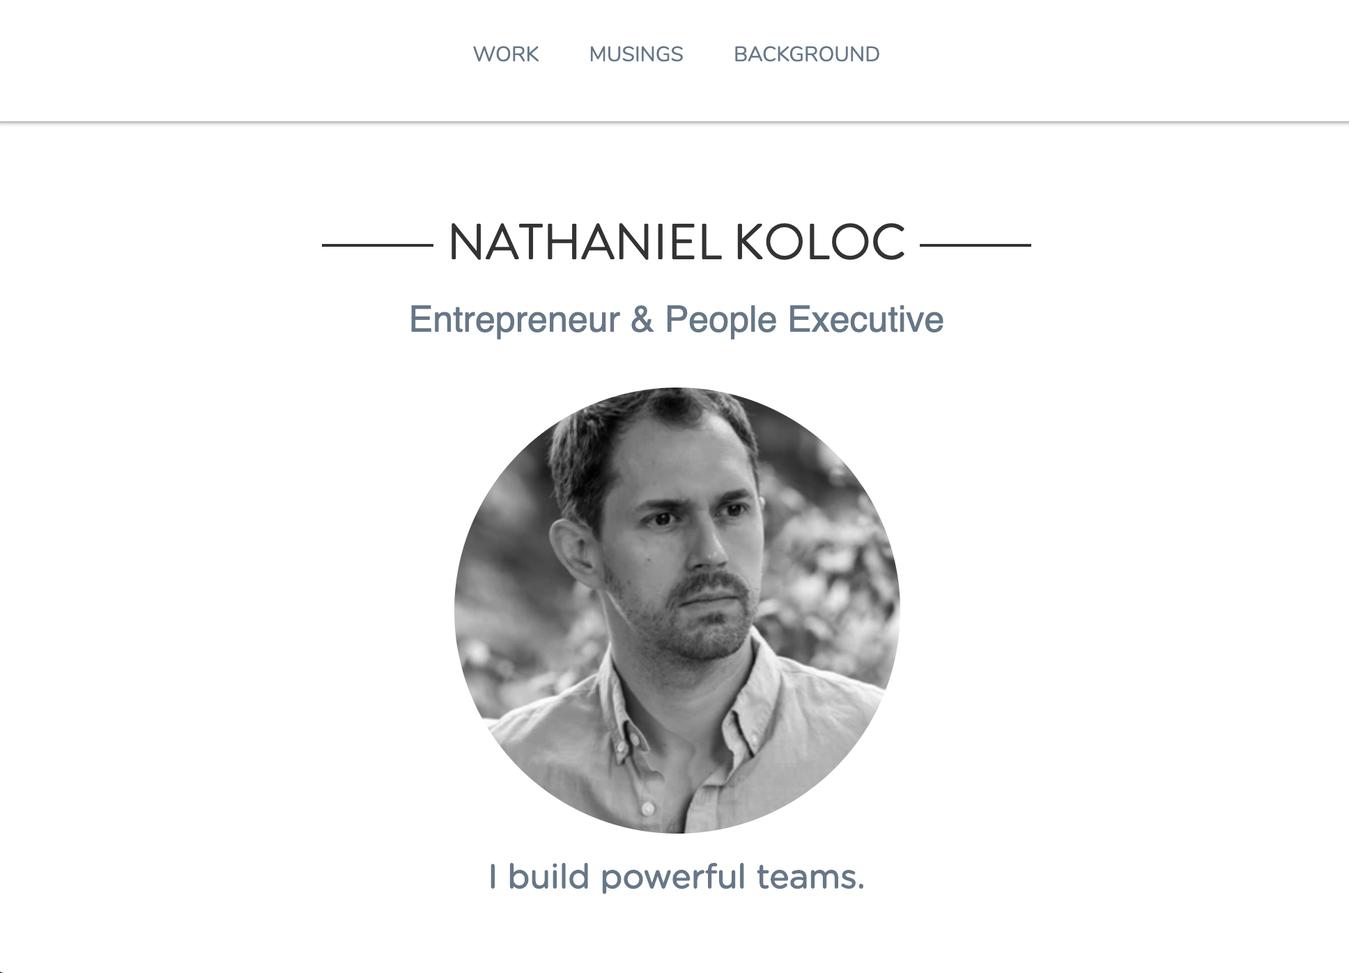 Nathaniel Koloc's Resume Website